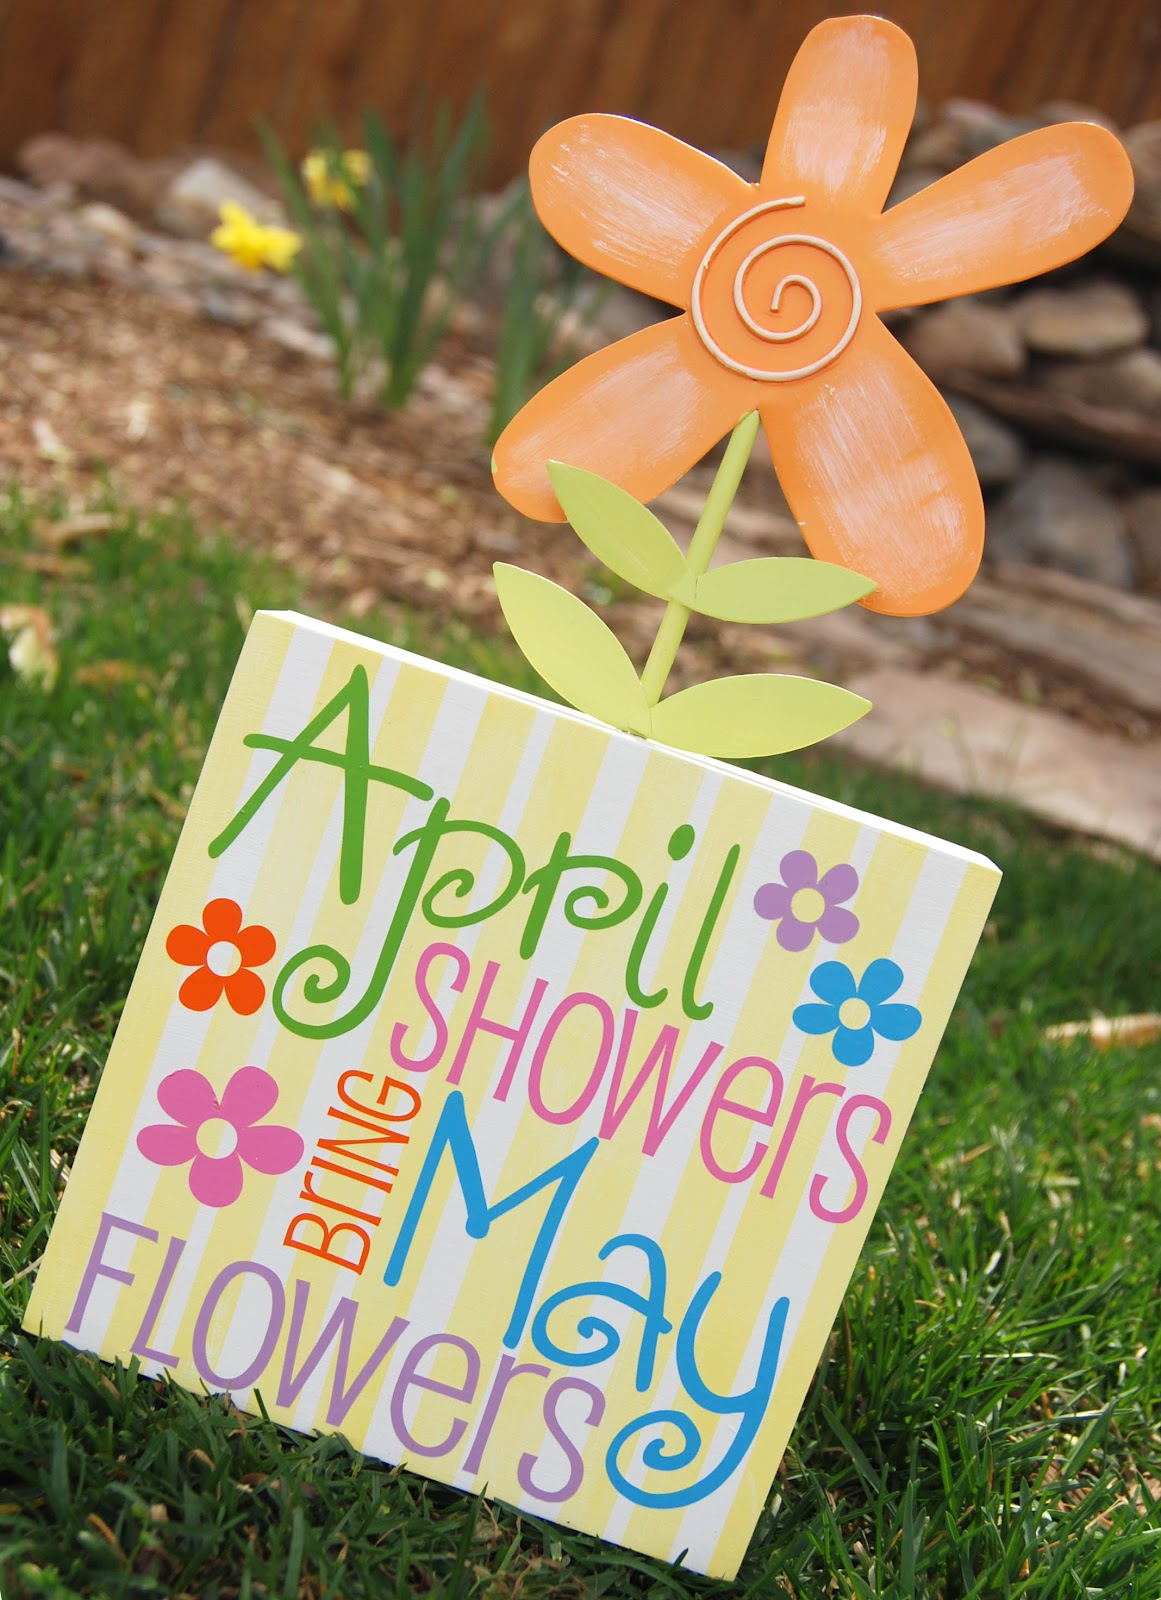 Burton Avenue April Showers Bring May Flowers Block